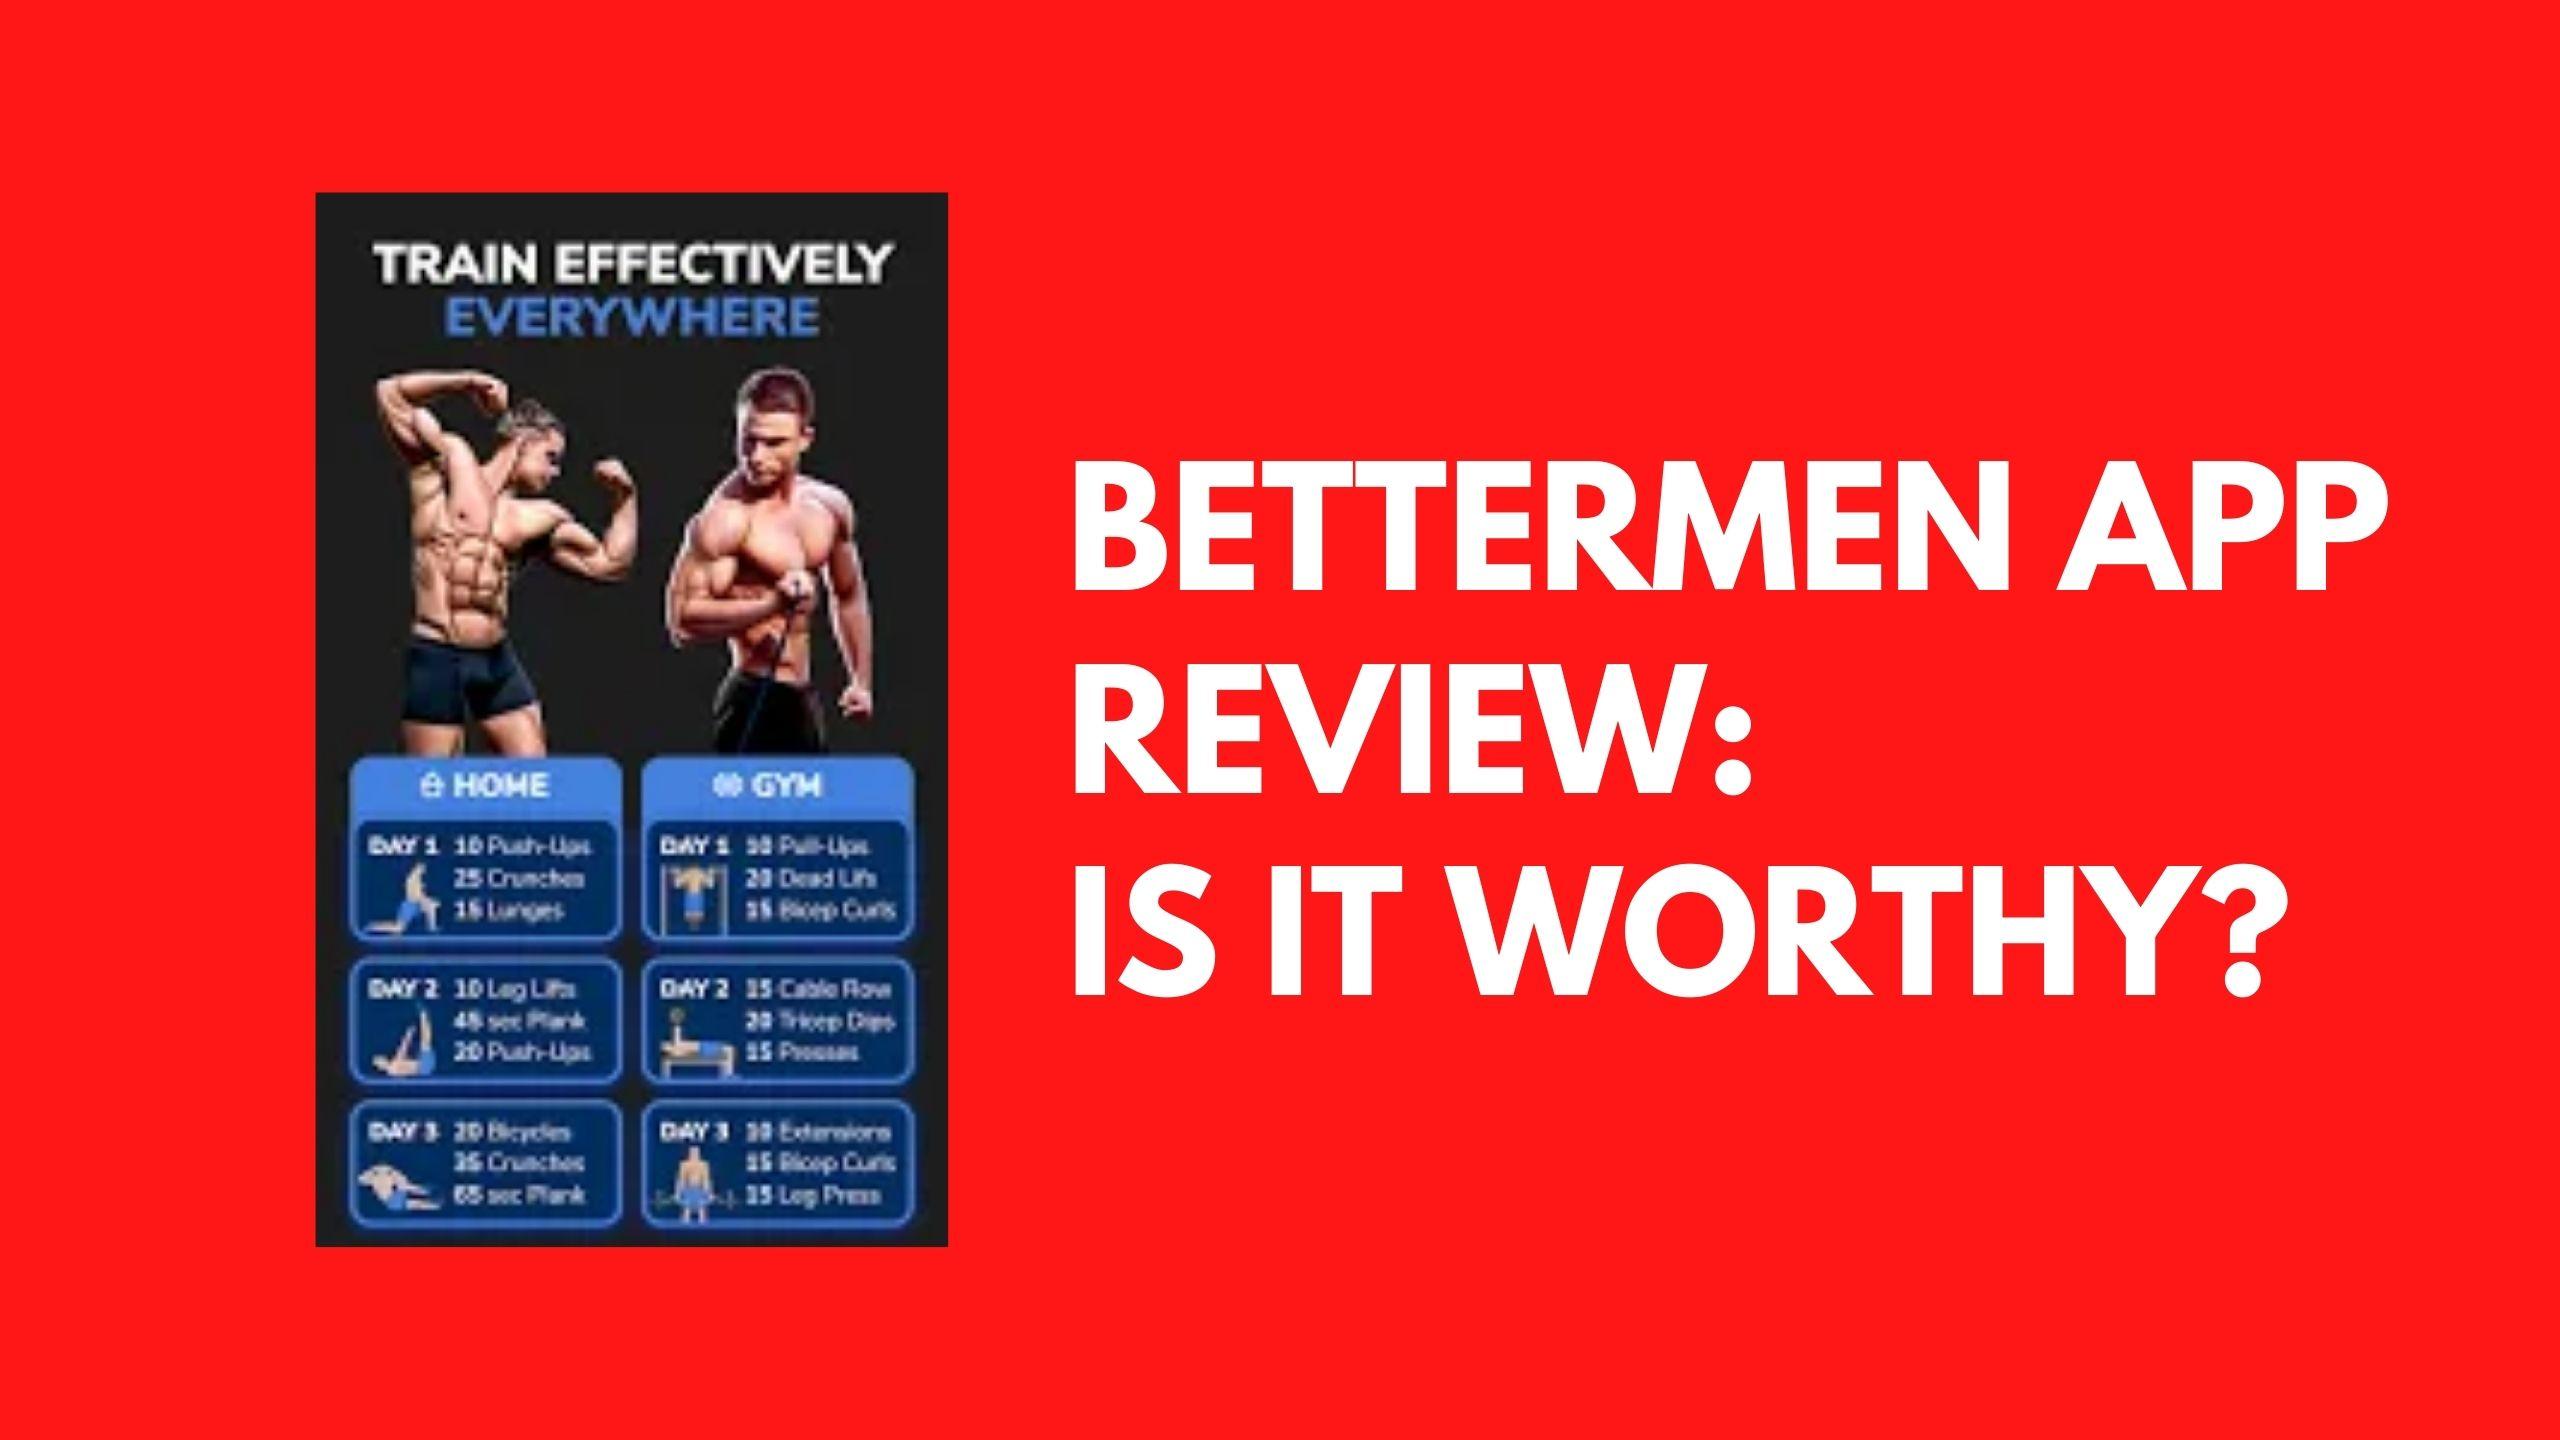 BetterMen App Review